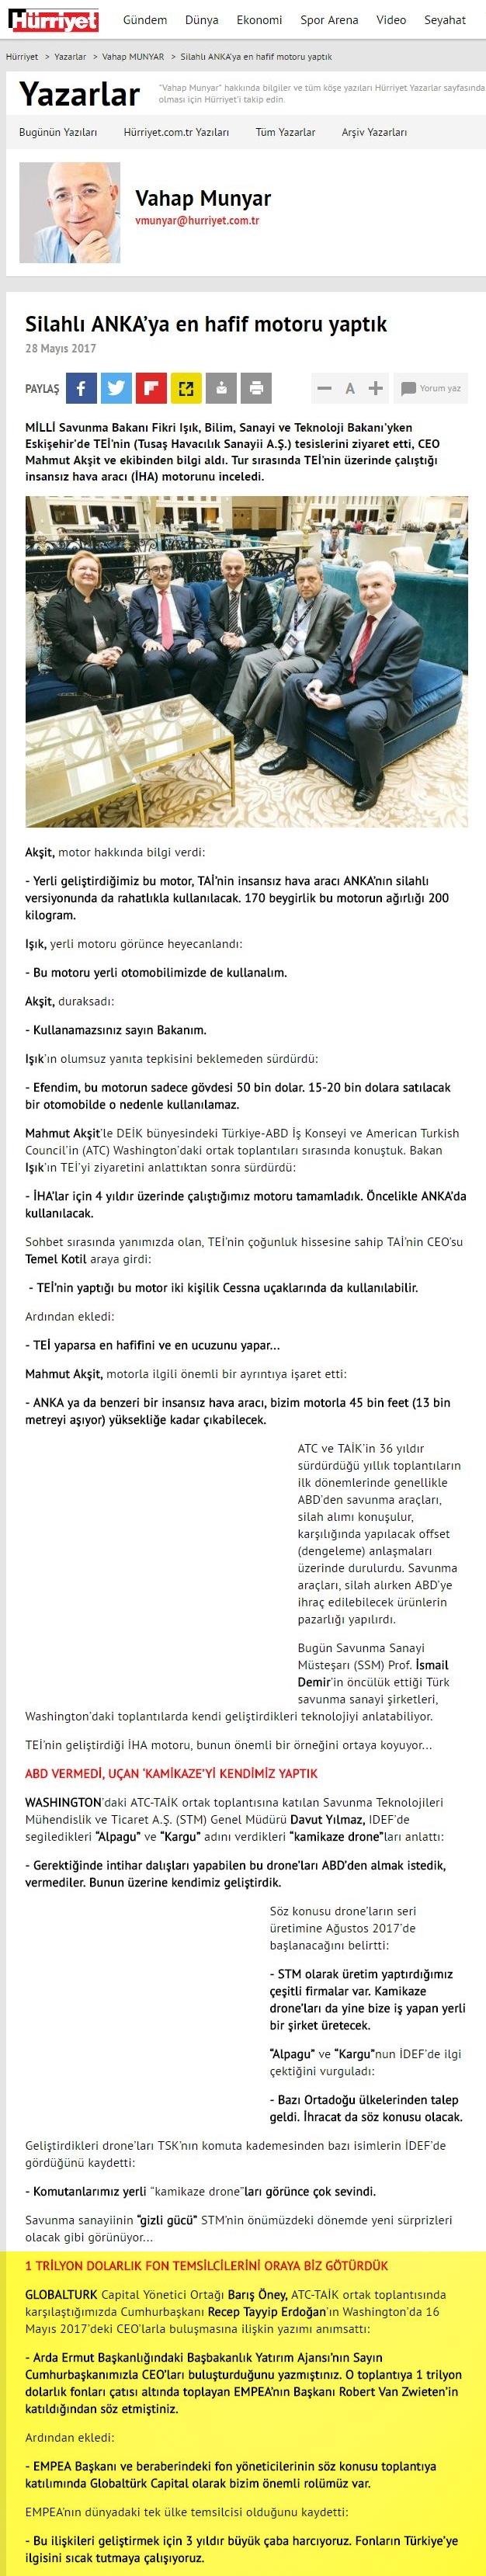 Silahlı ANKA'ya En Hafif Motoru Yaptık | Hurriyet.com.tr